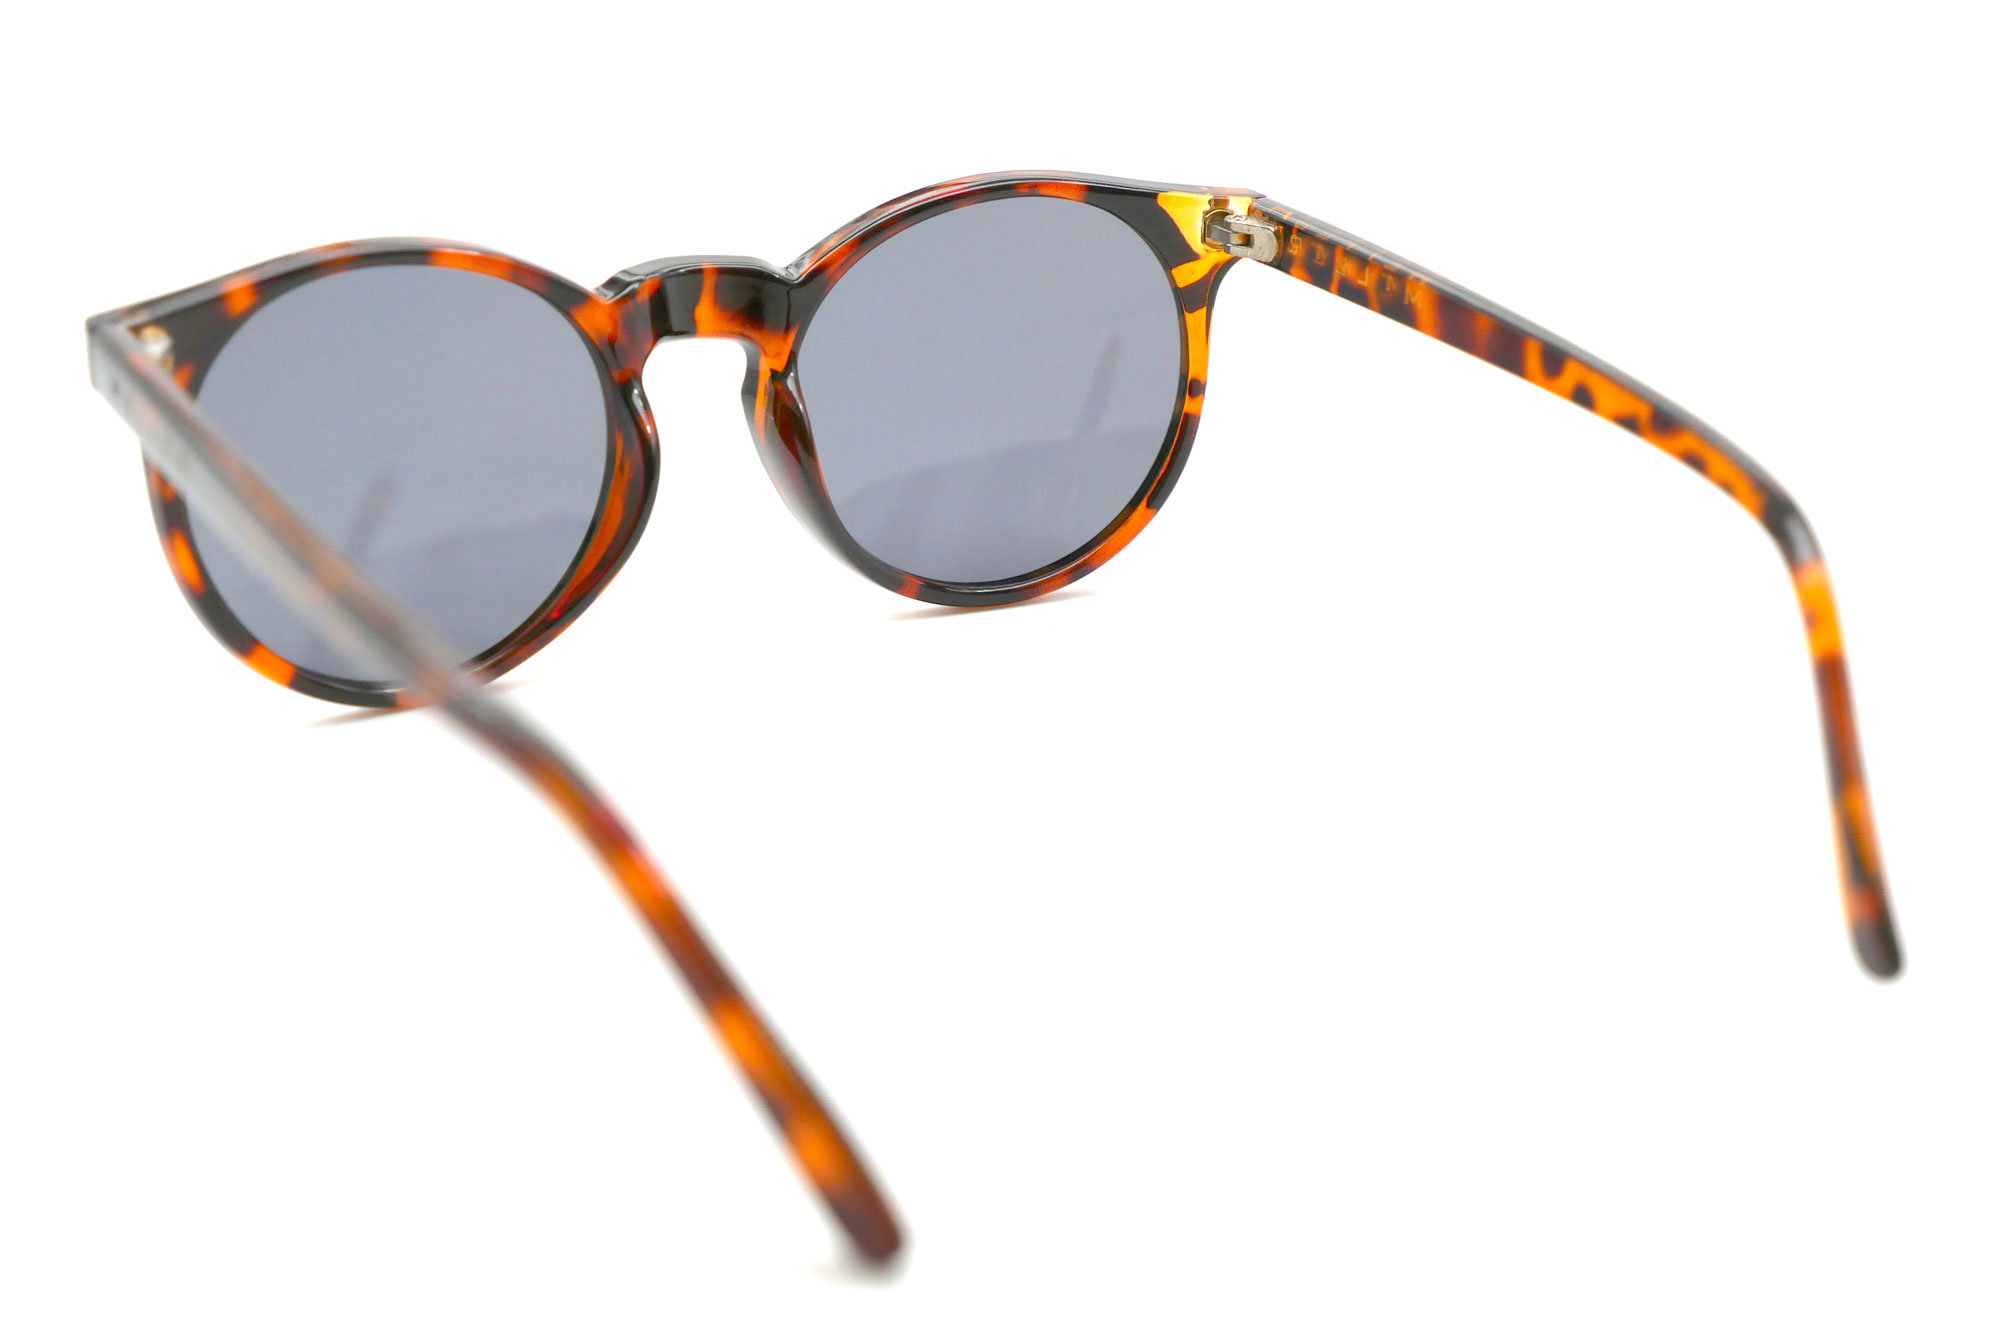 New Coming Fashion Round Demi Frame UV400 Lens Sunglasses